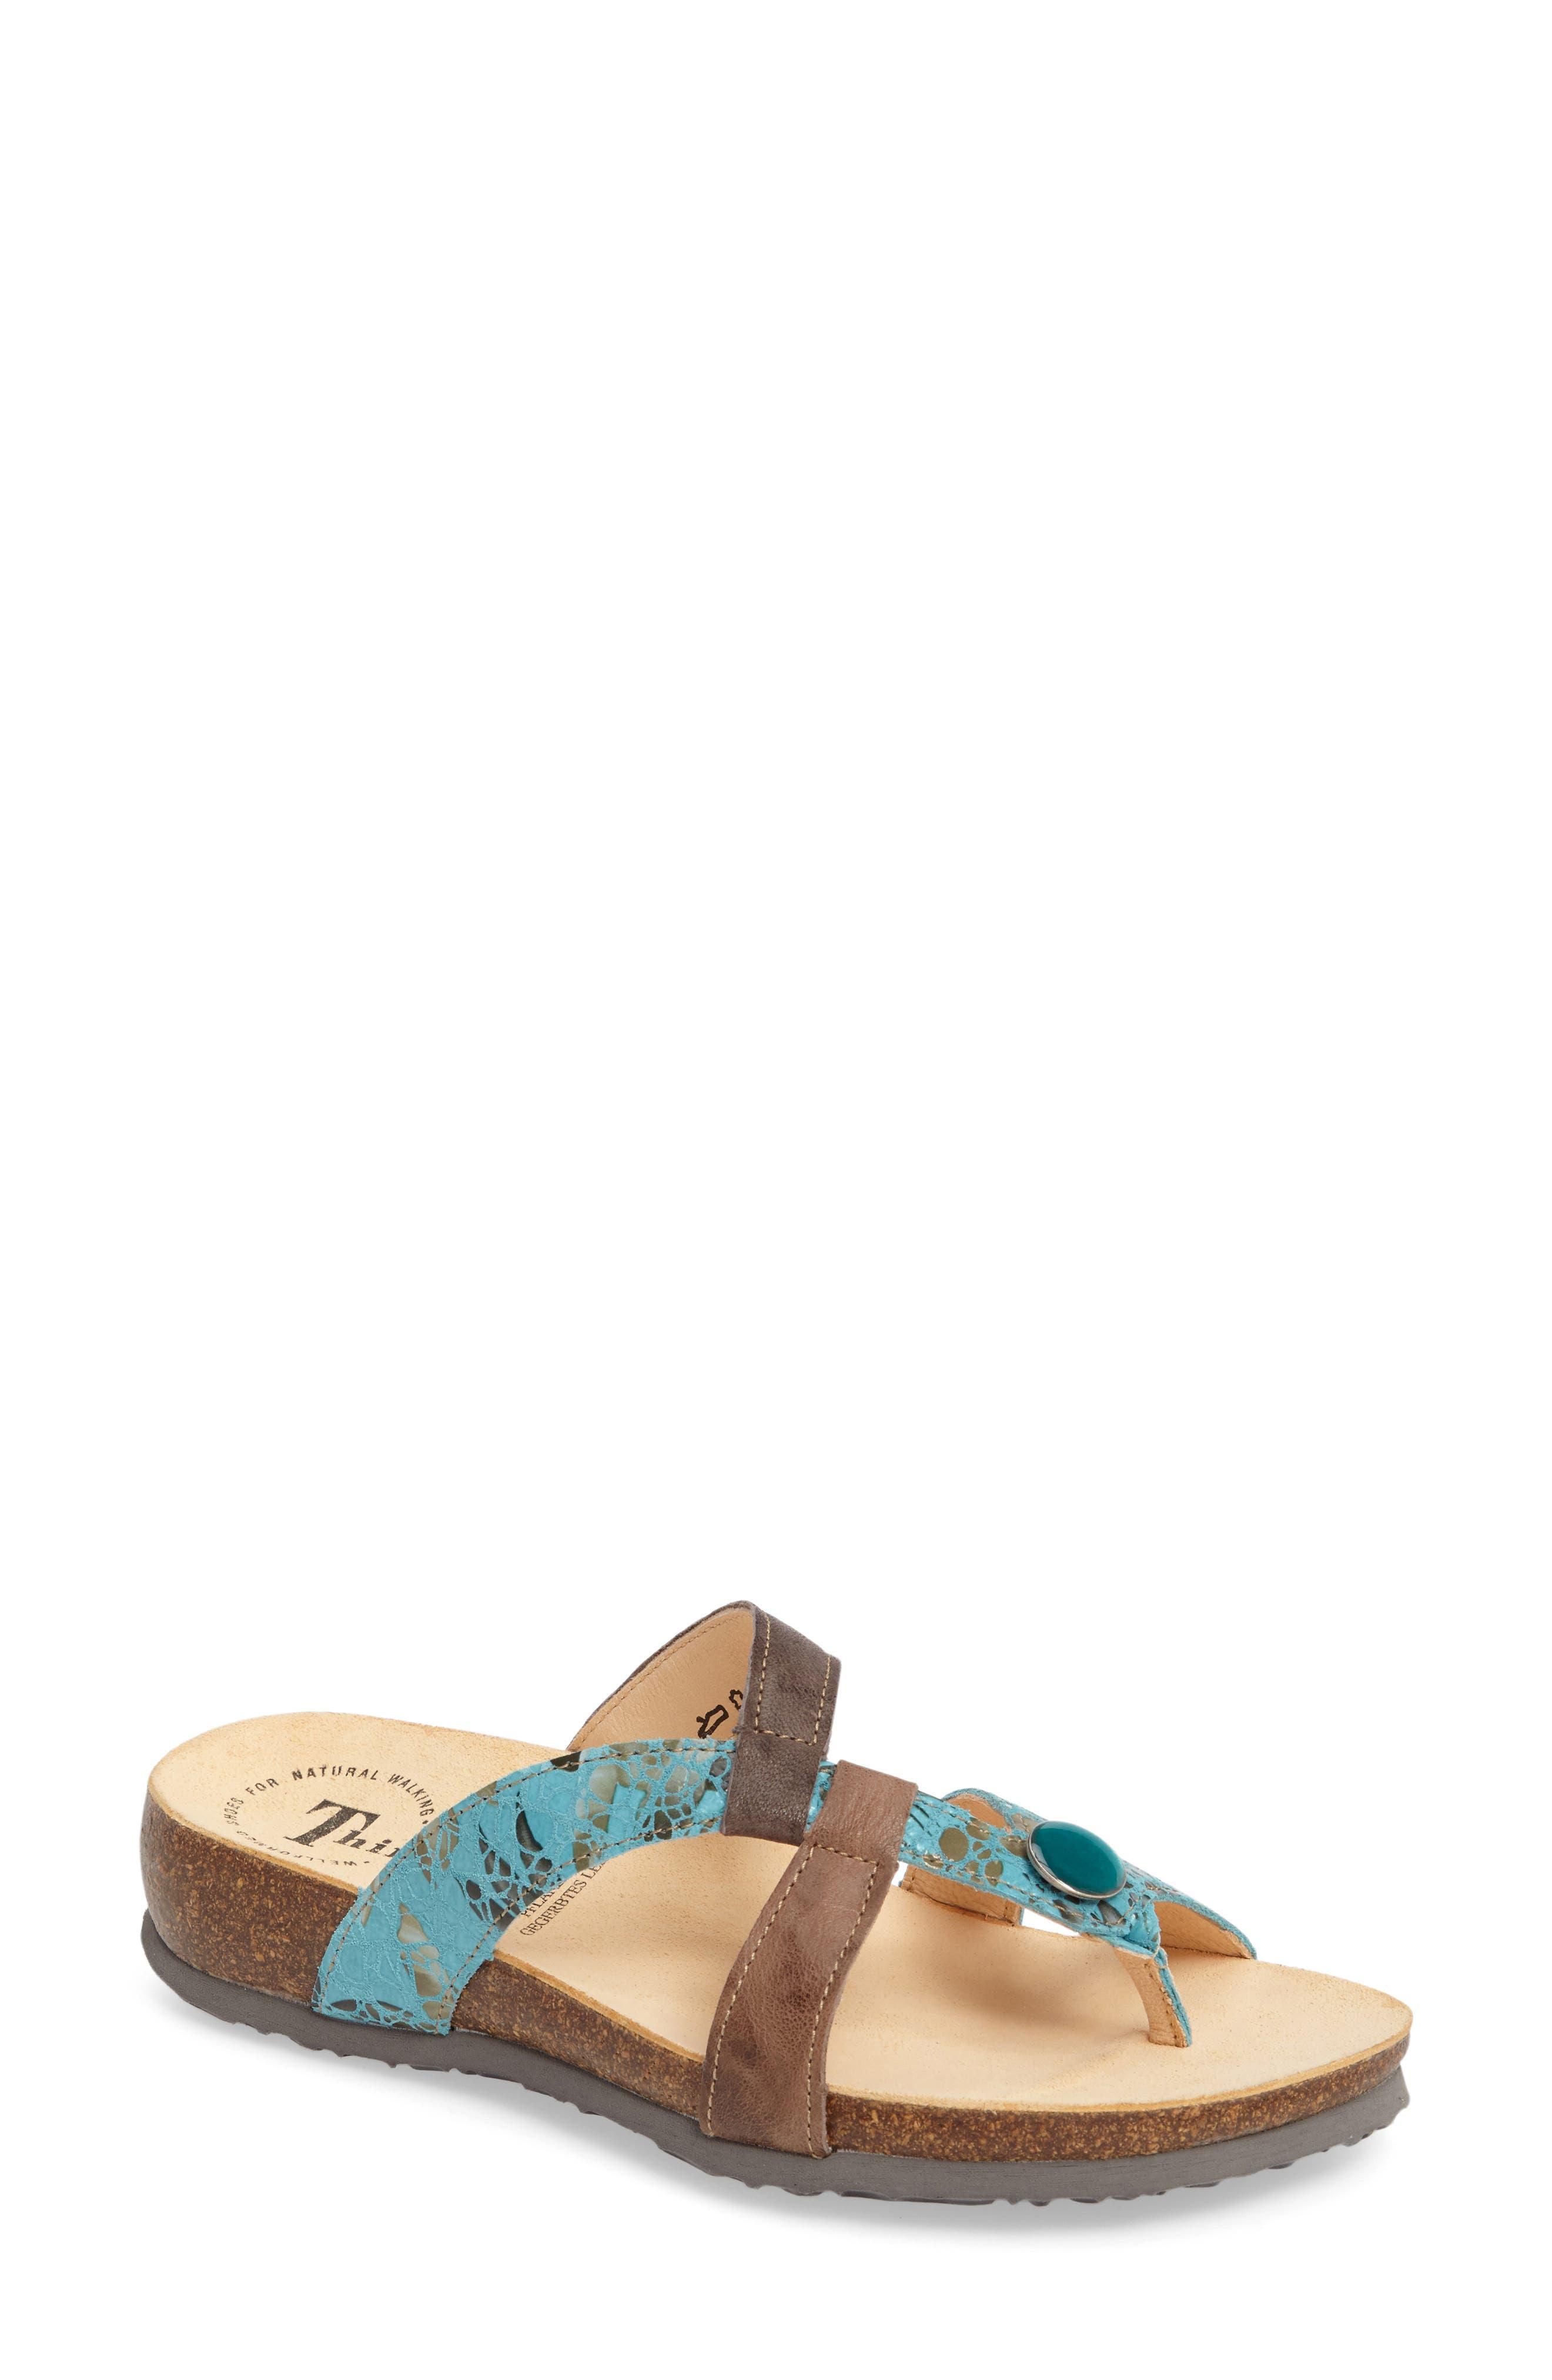 Main Image - Think! 'Julia Strappy' Sandal